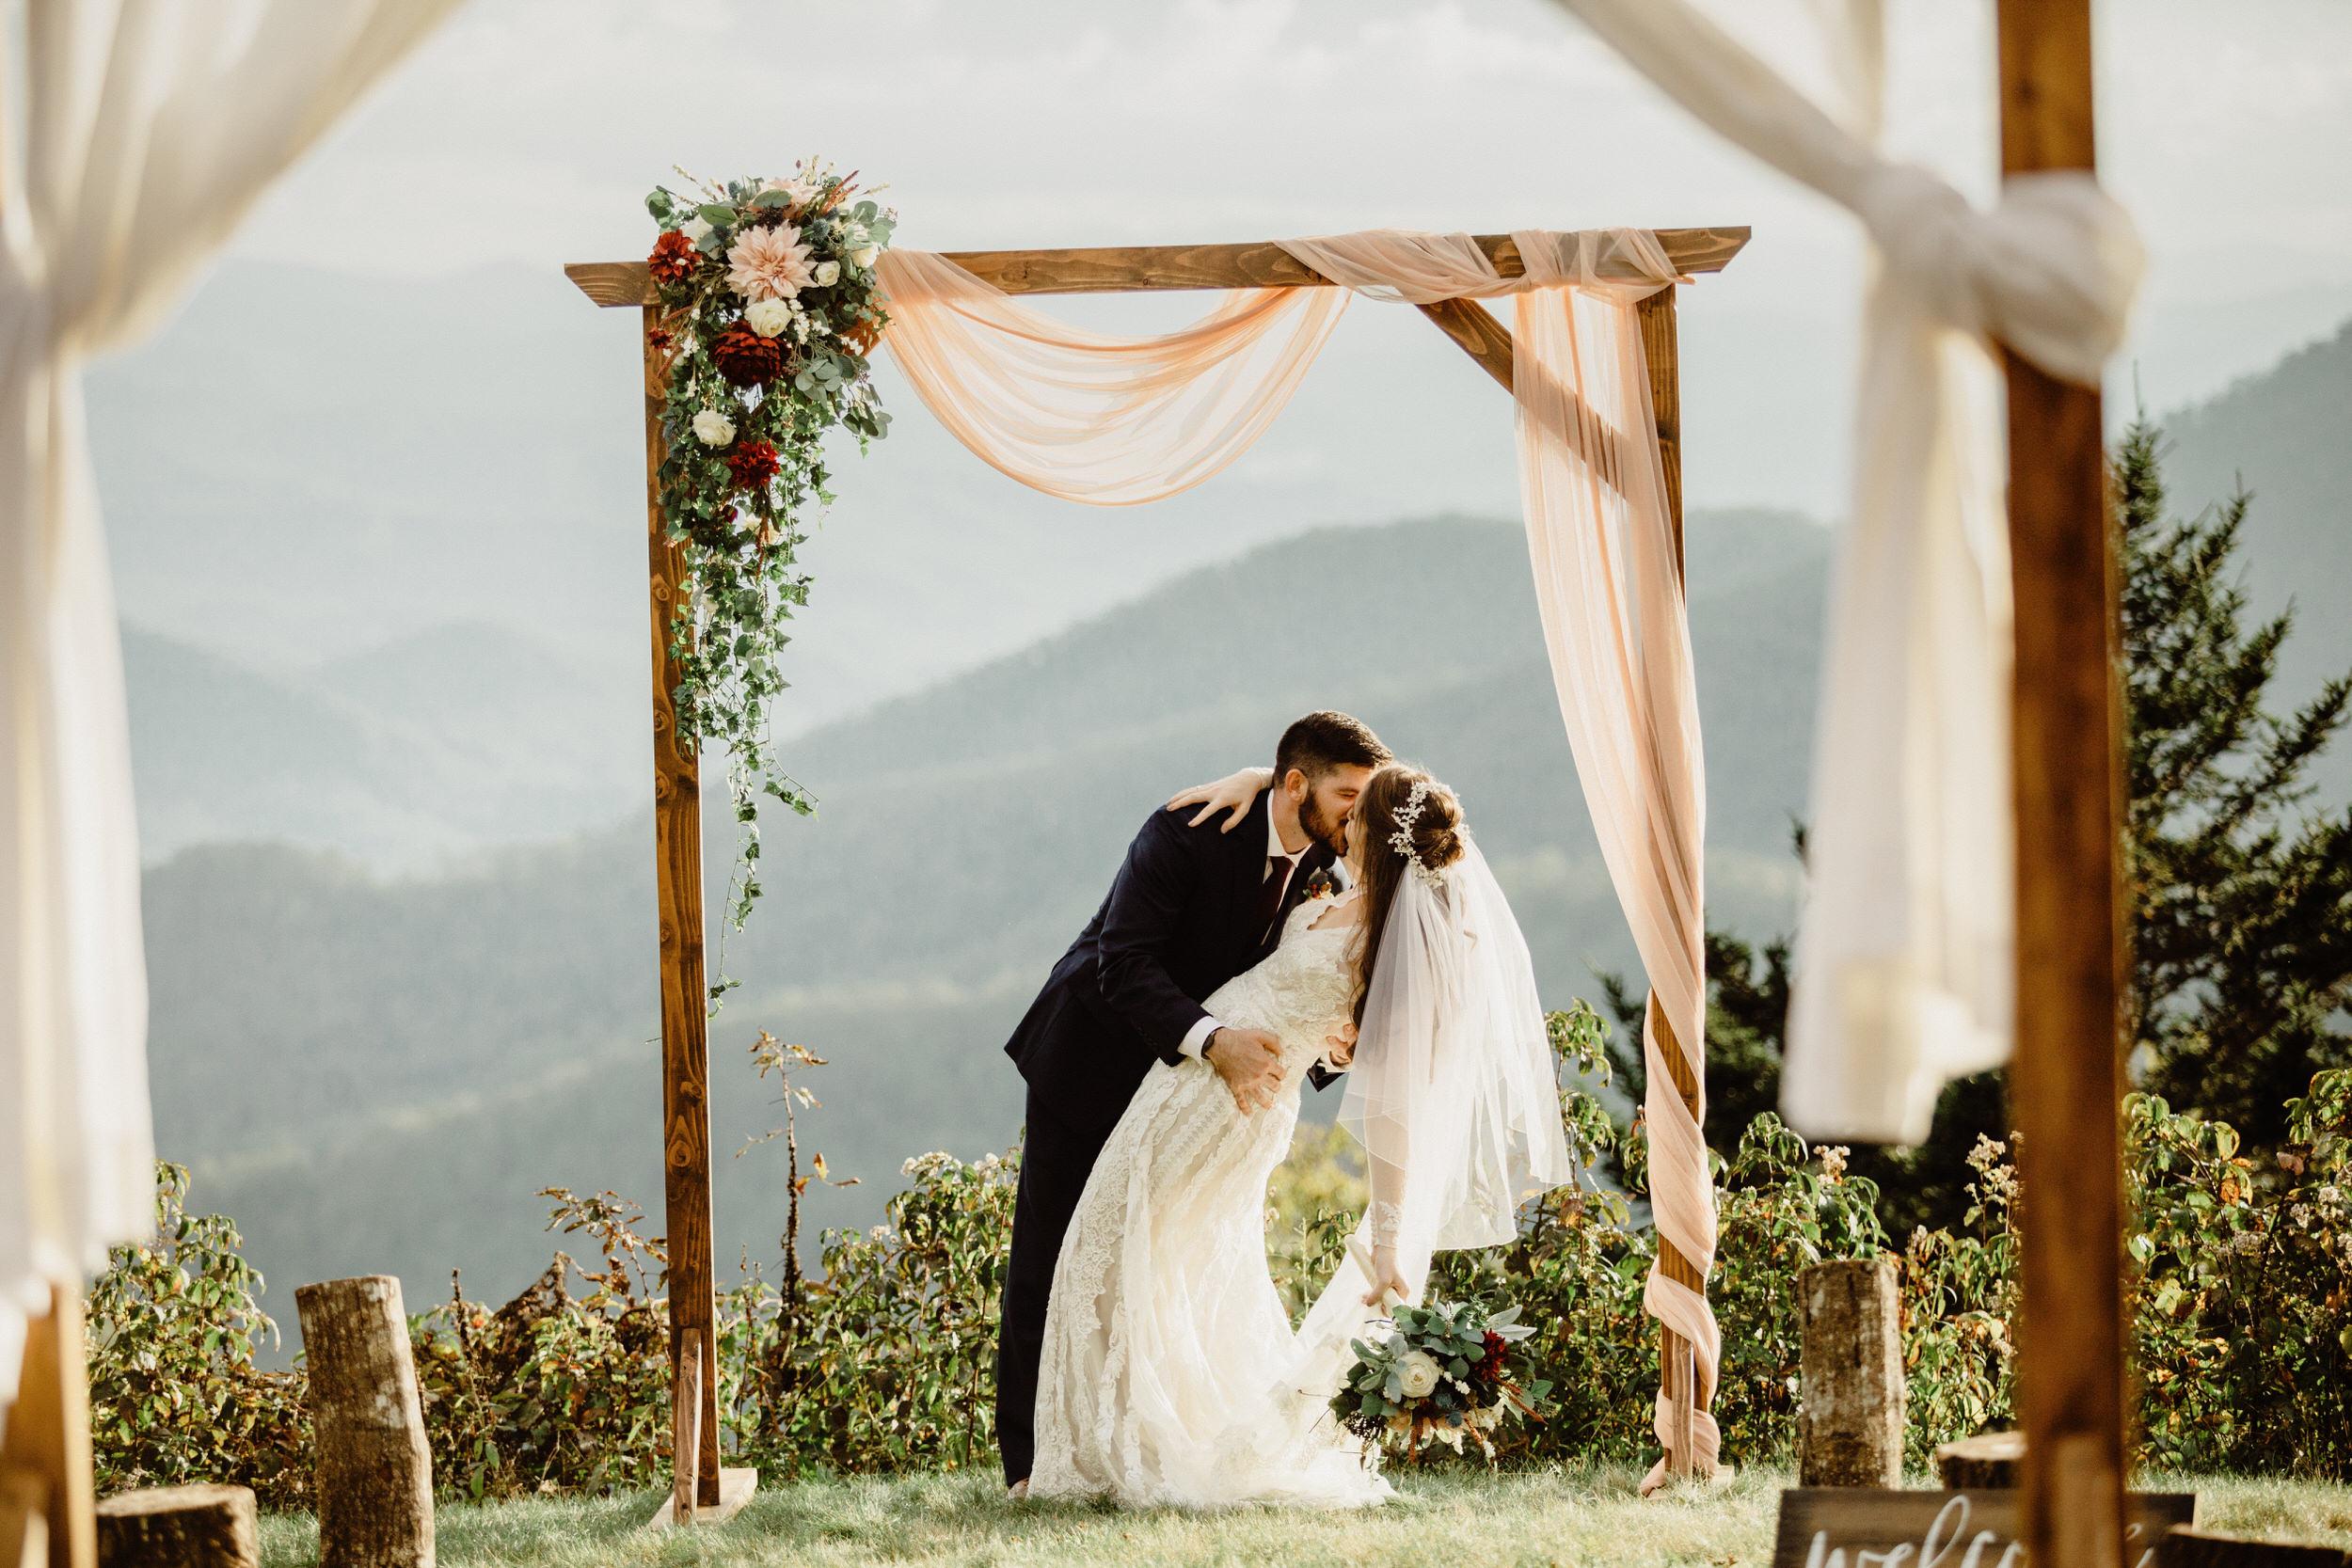 5. Mountain Bride & Groom Portraits- Cole + Rachel's Great Smoky Mountain National Park Elopement-44.jpg